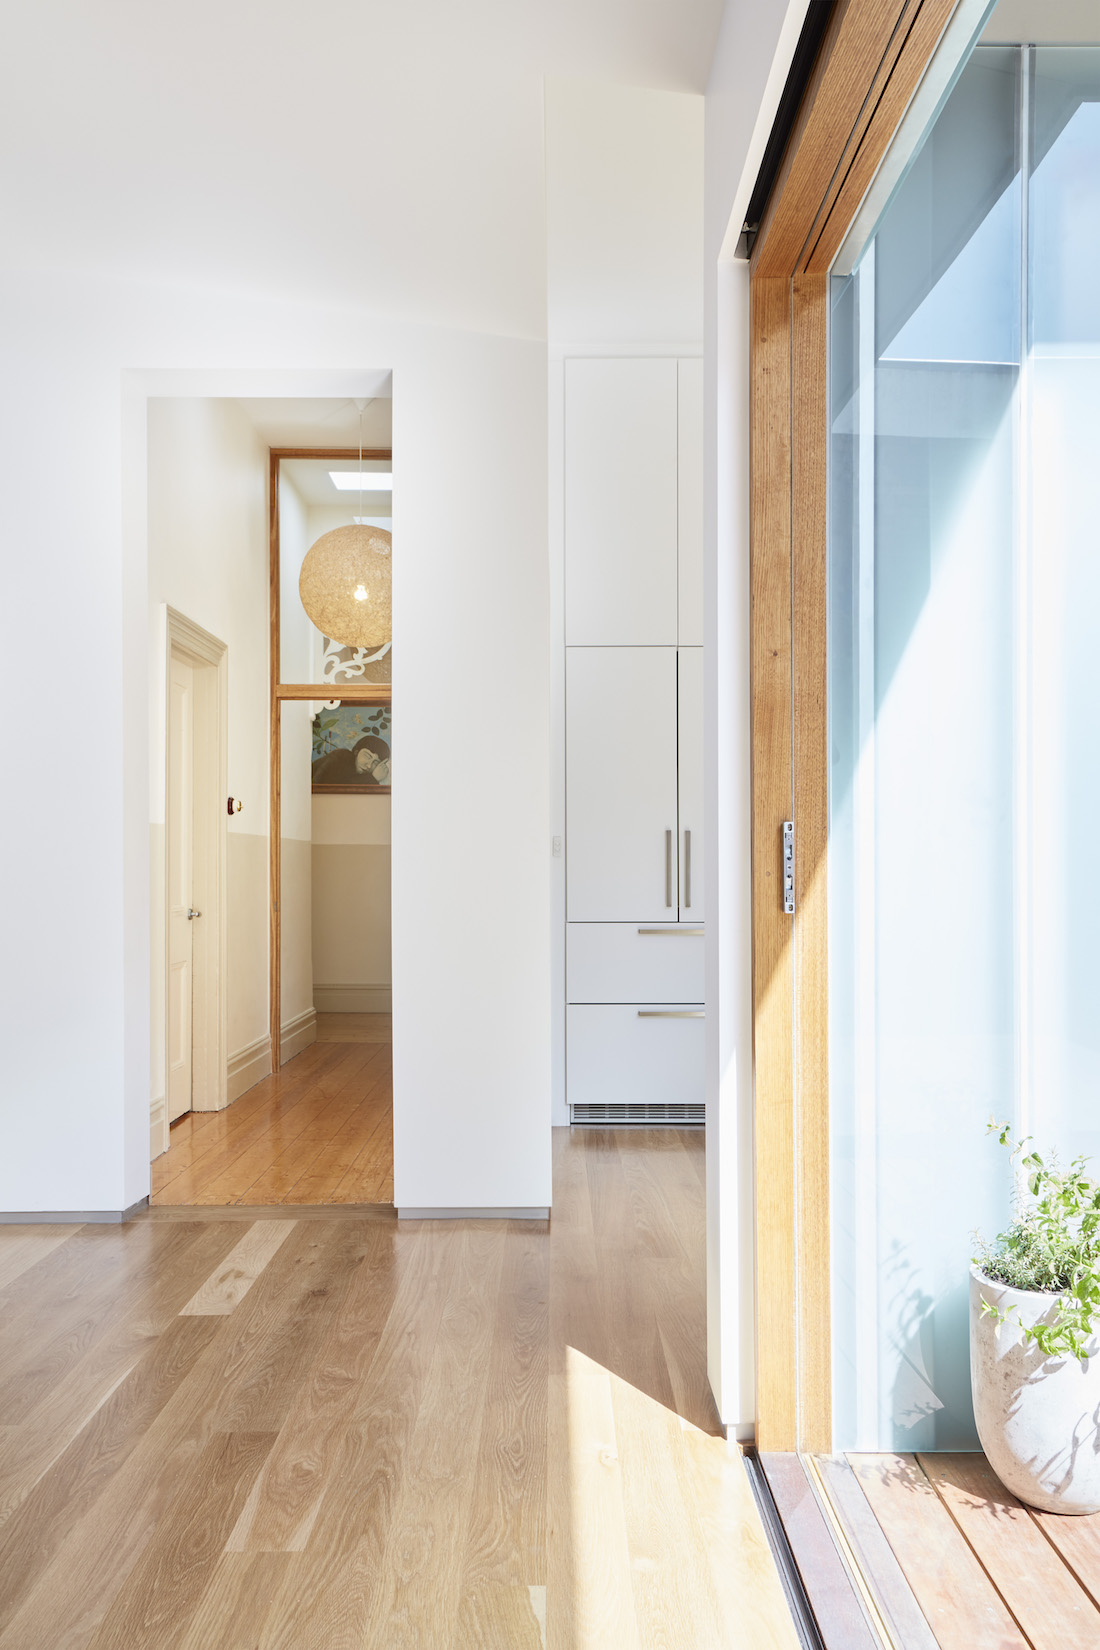 Steffen Welsch Architects - Parkville Connect House - Architecture & Interior Archive - Image 1